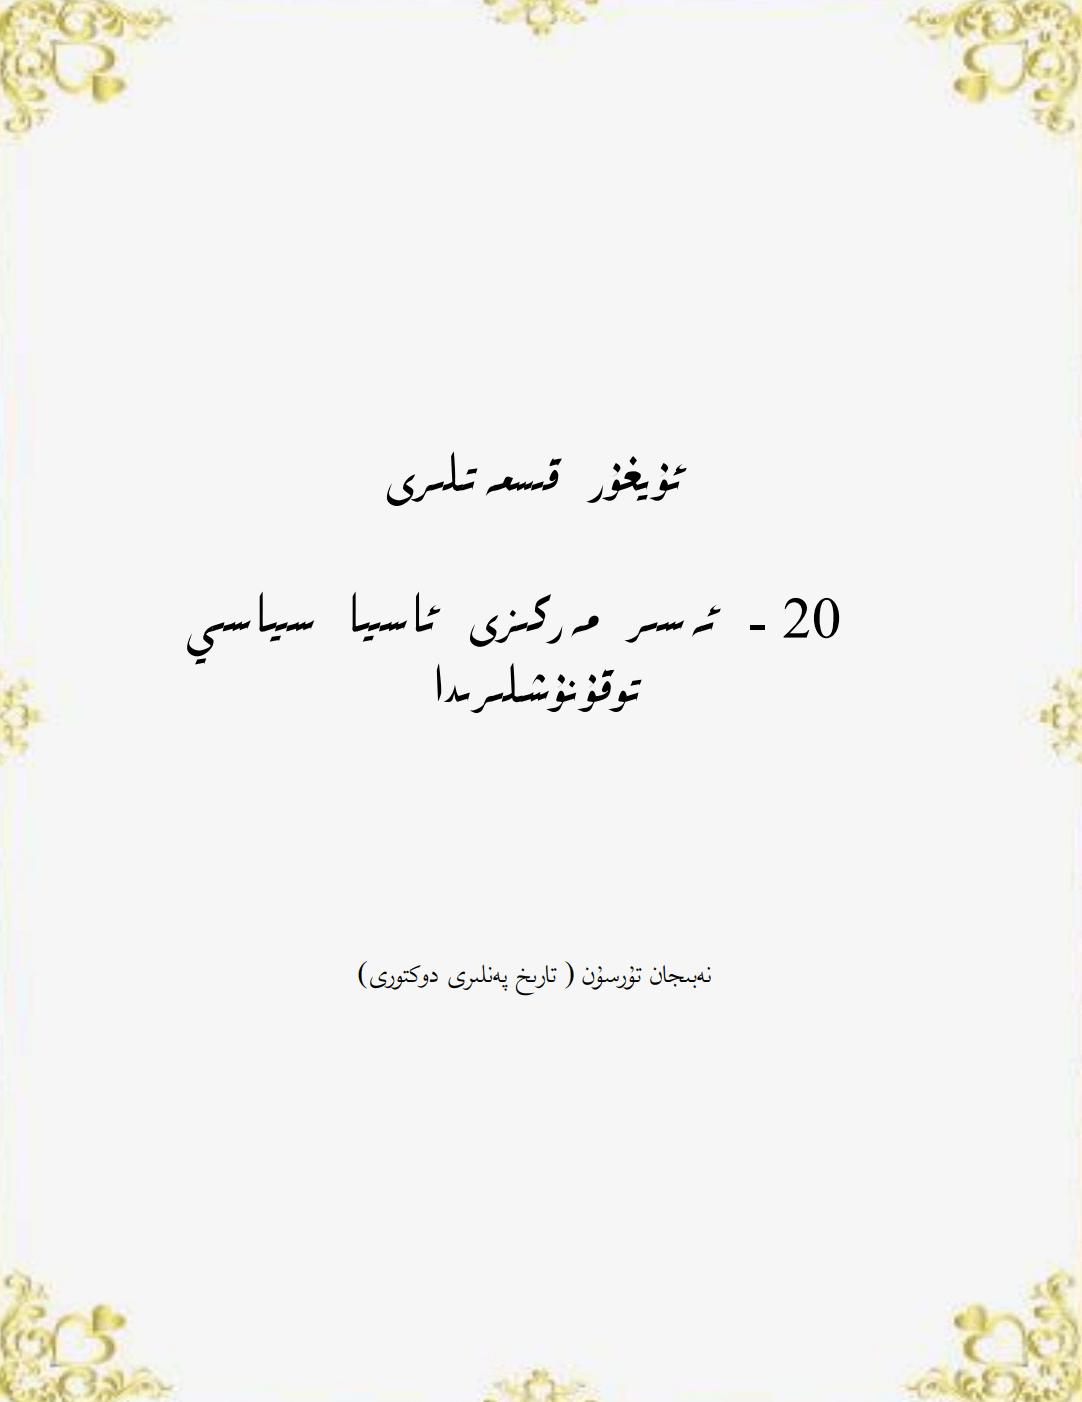 Uyghur Qismetliri pdf - ئۇيغۇر قىسمەتلىرى 20-ئەسىر مەركىزى ئاسىيا سىياسىي توقۇنۇشلىرىدا(نەبىجان تۇرسۇن)